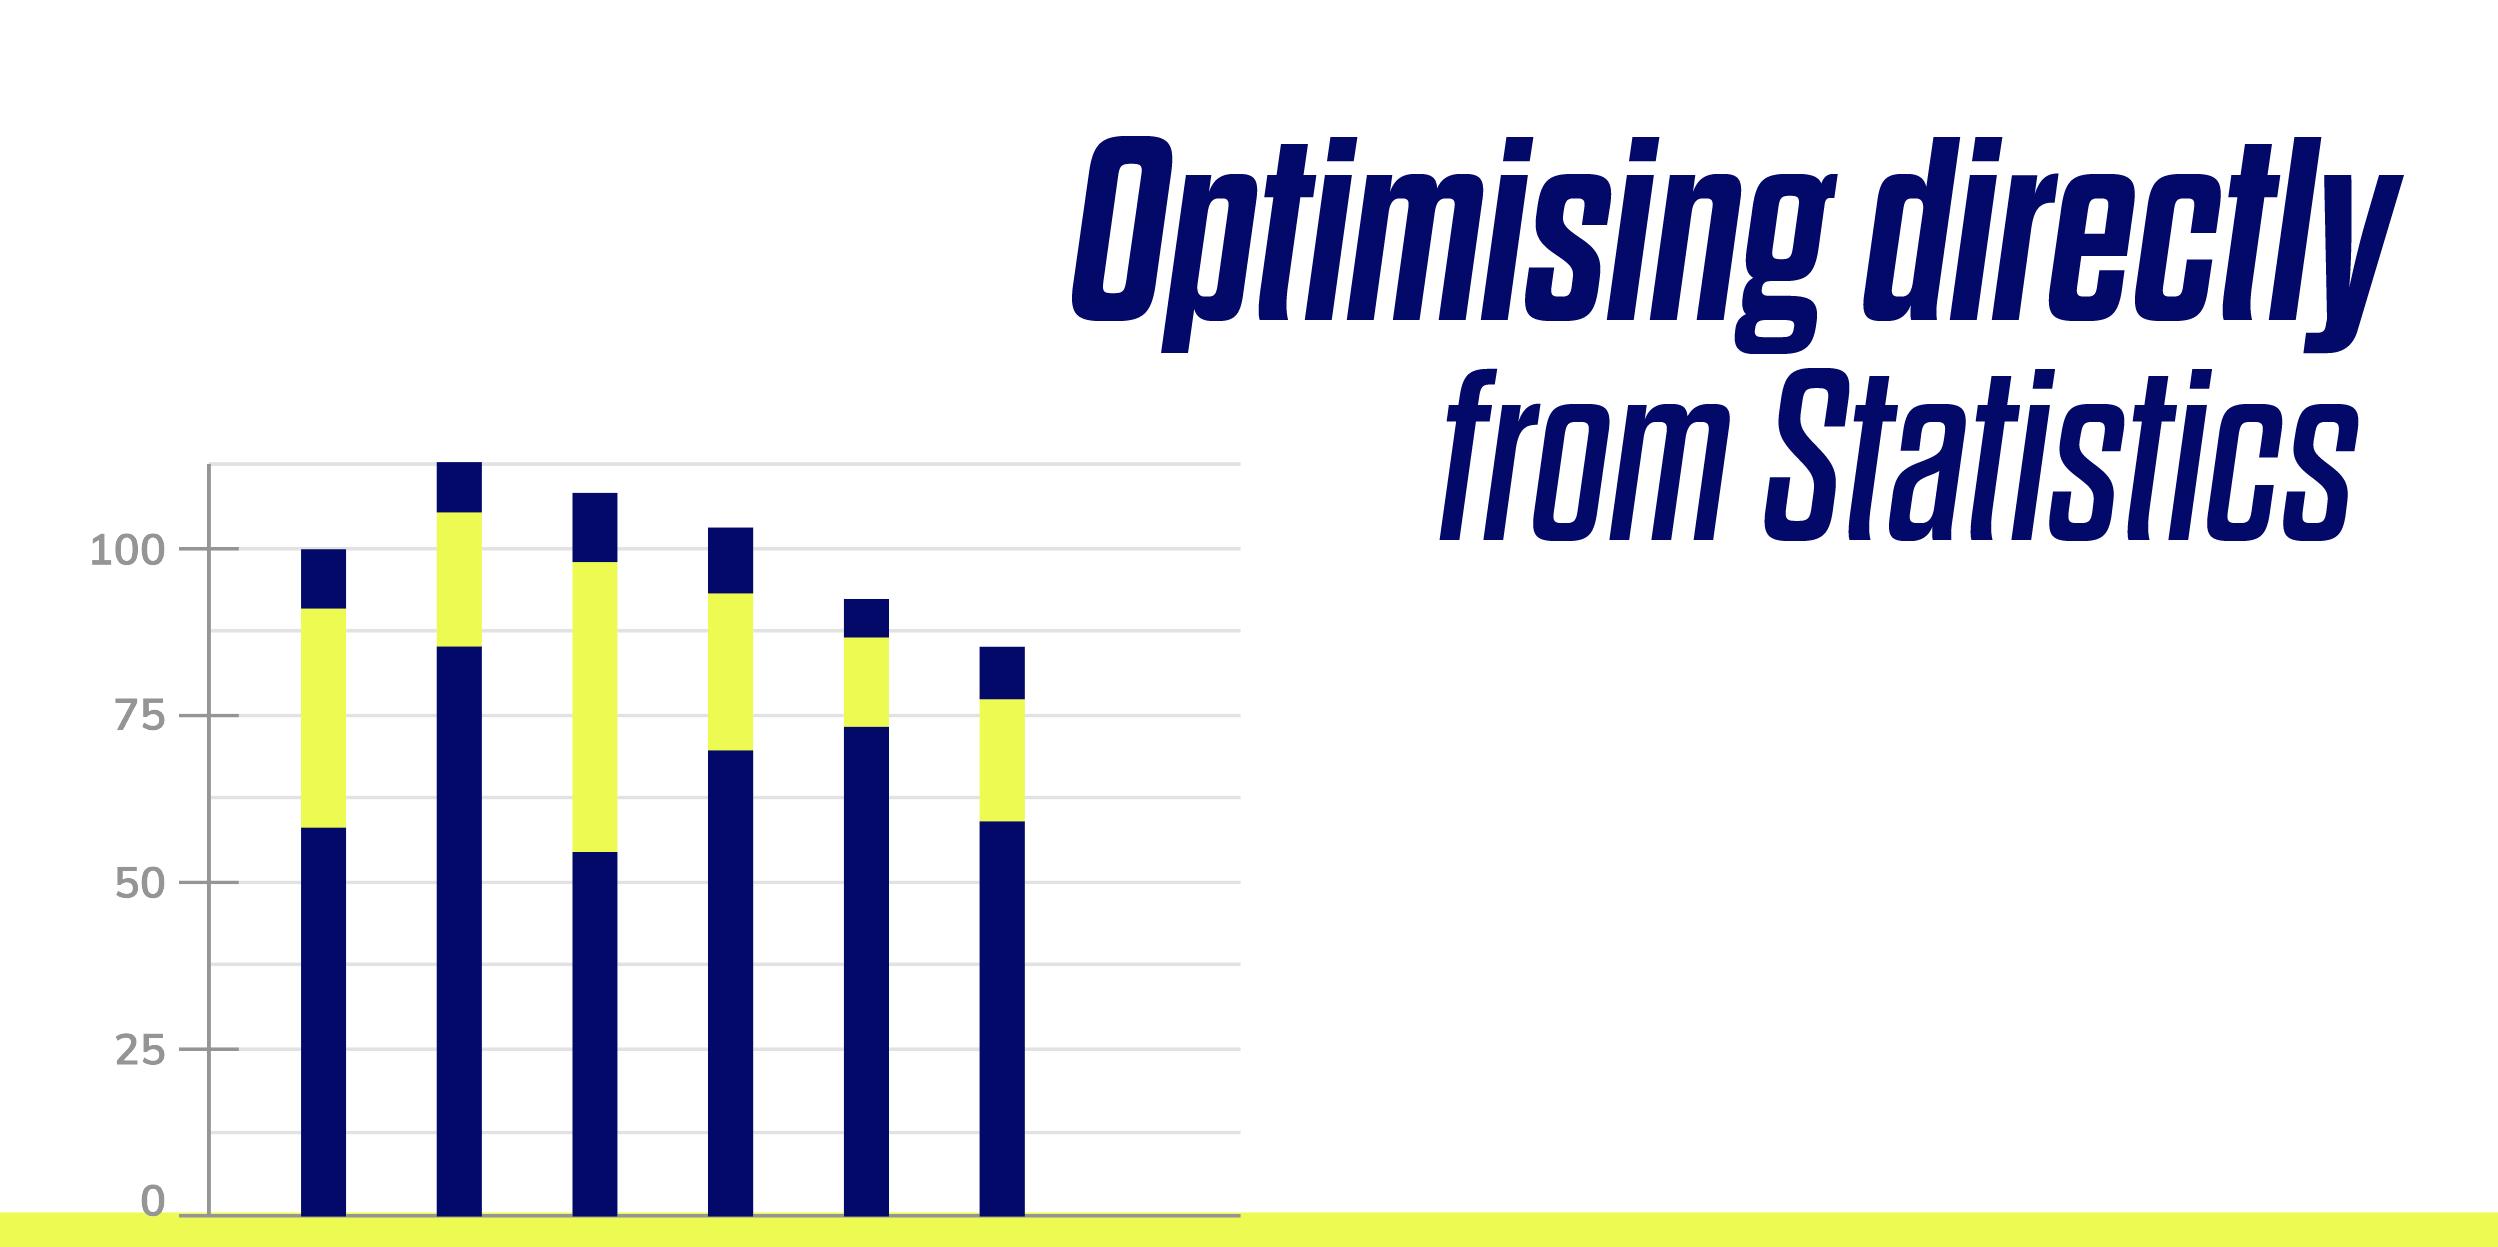 Optimising directly in statistics panel